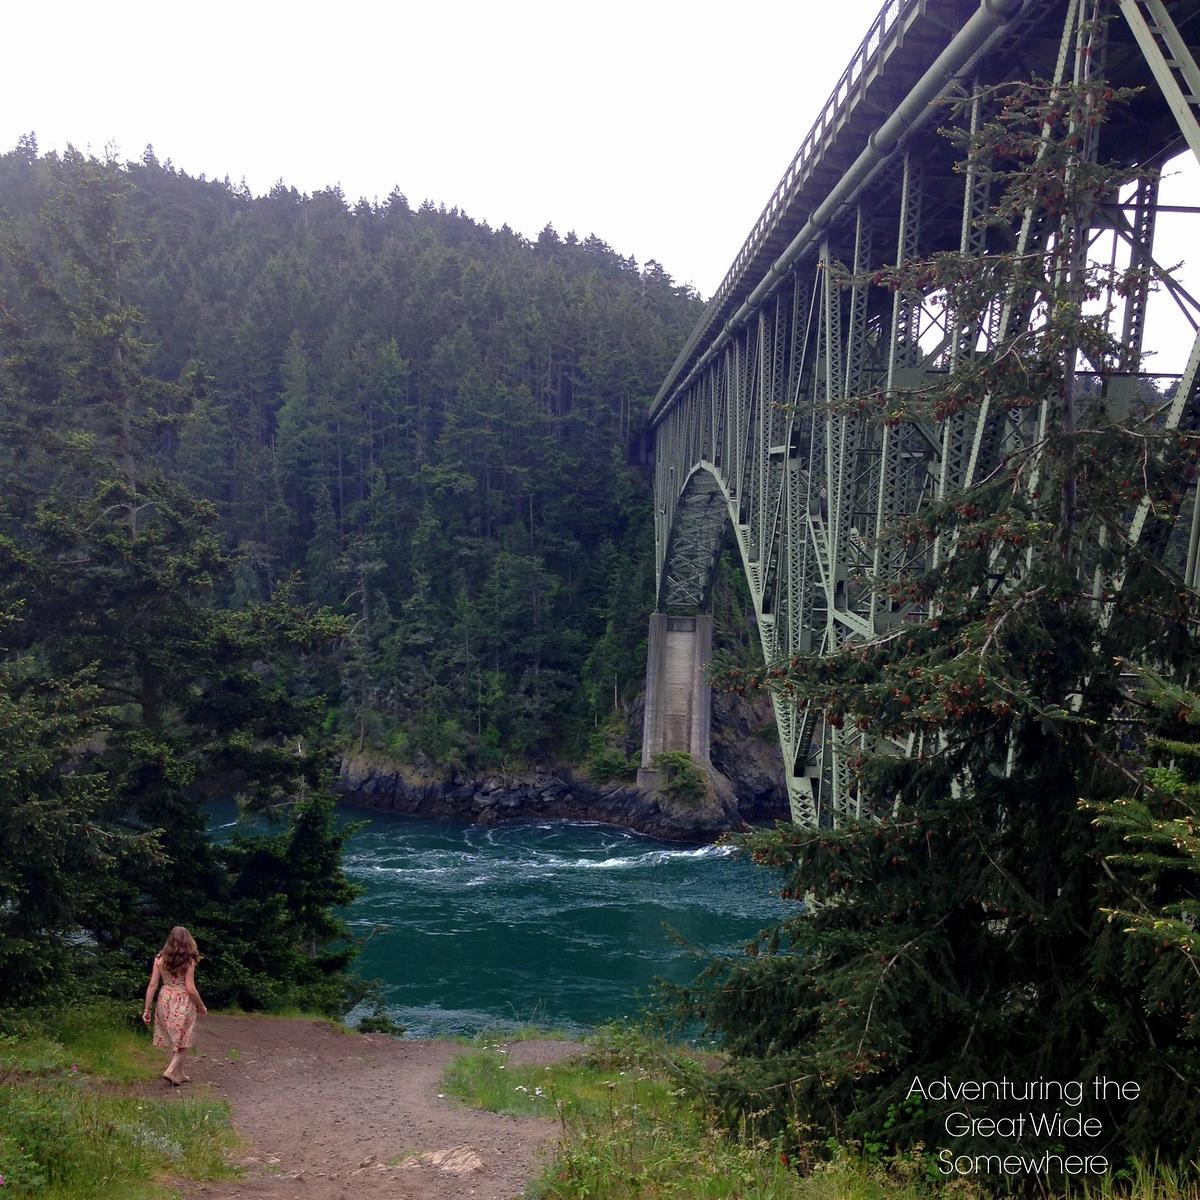 Michelle Exploring Beneath Deception Pass Bridge in Washington State